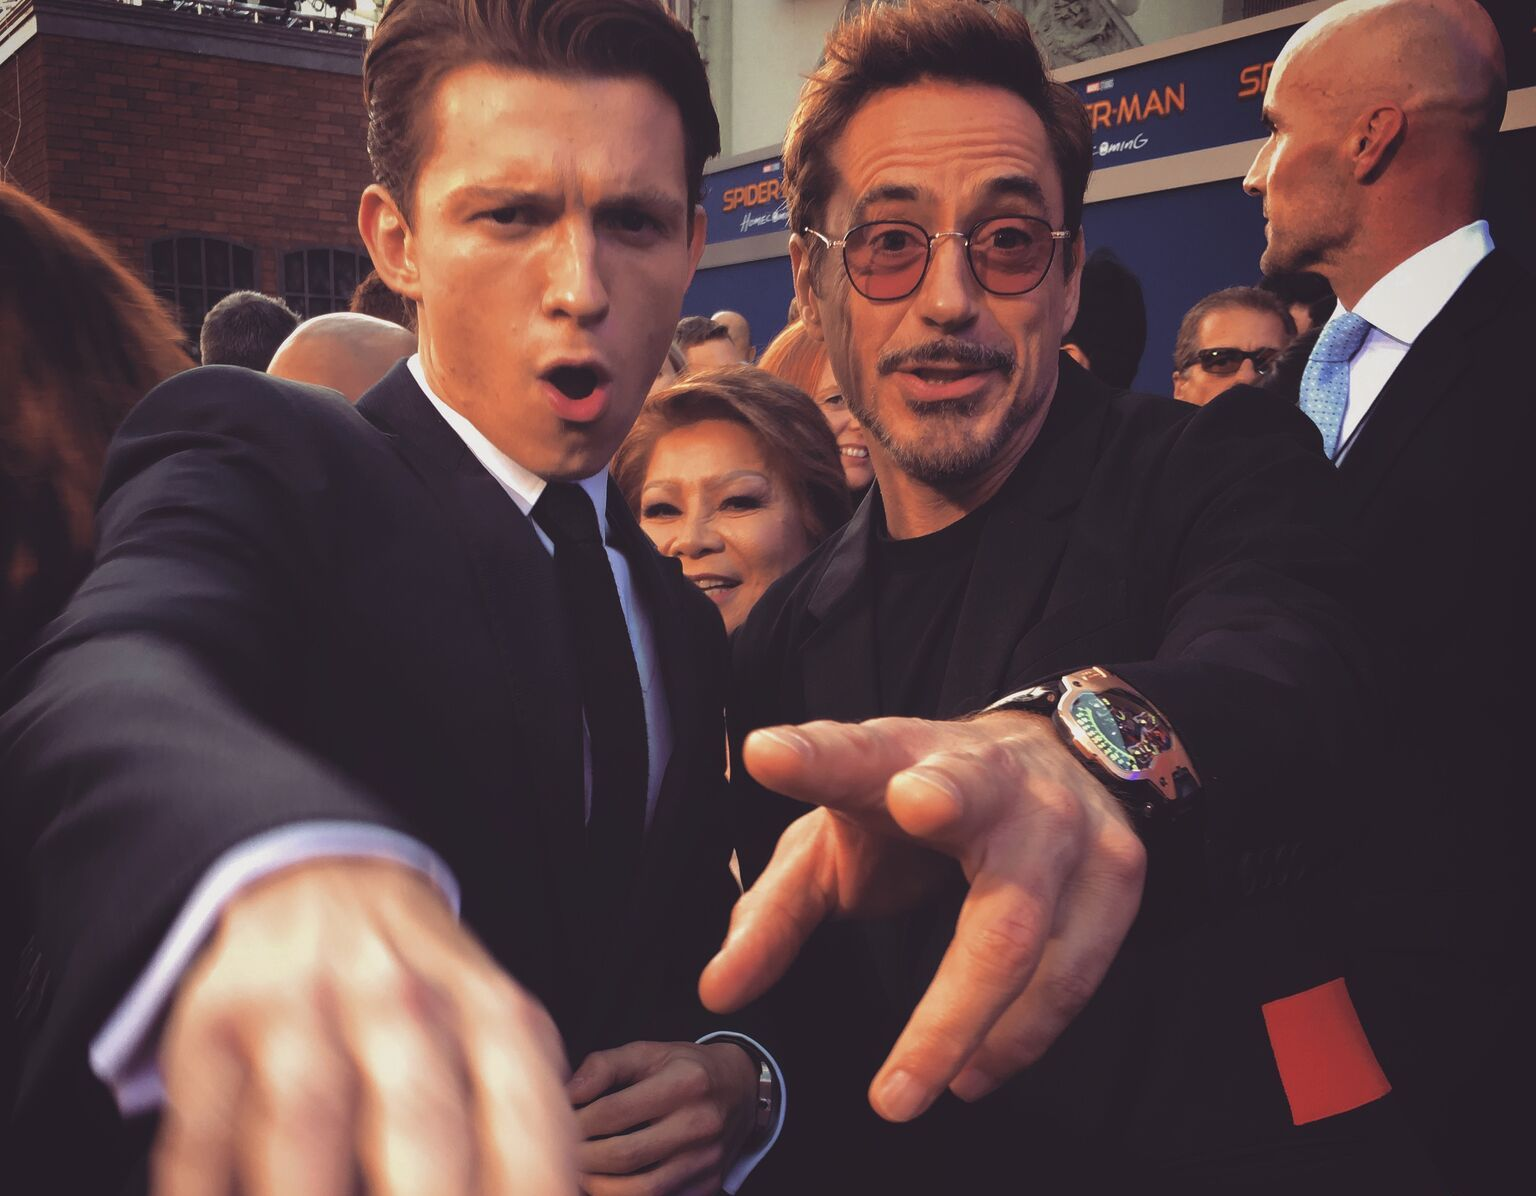 Spotted - Robert Downey JR - URWERK UR-110 - Spider-Man Homecoming